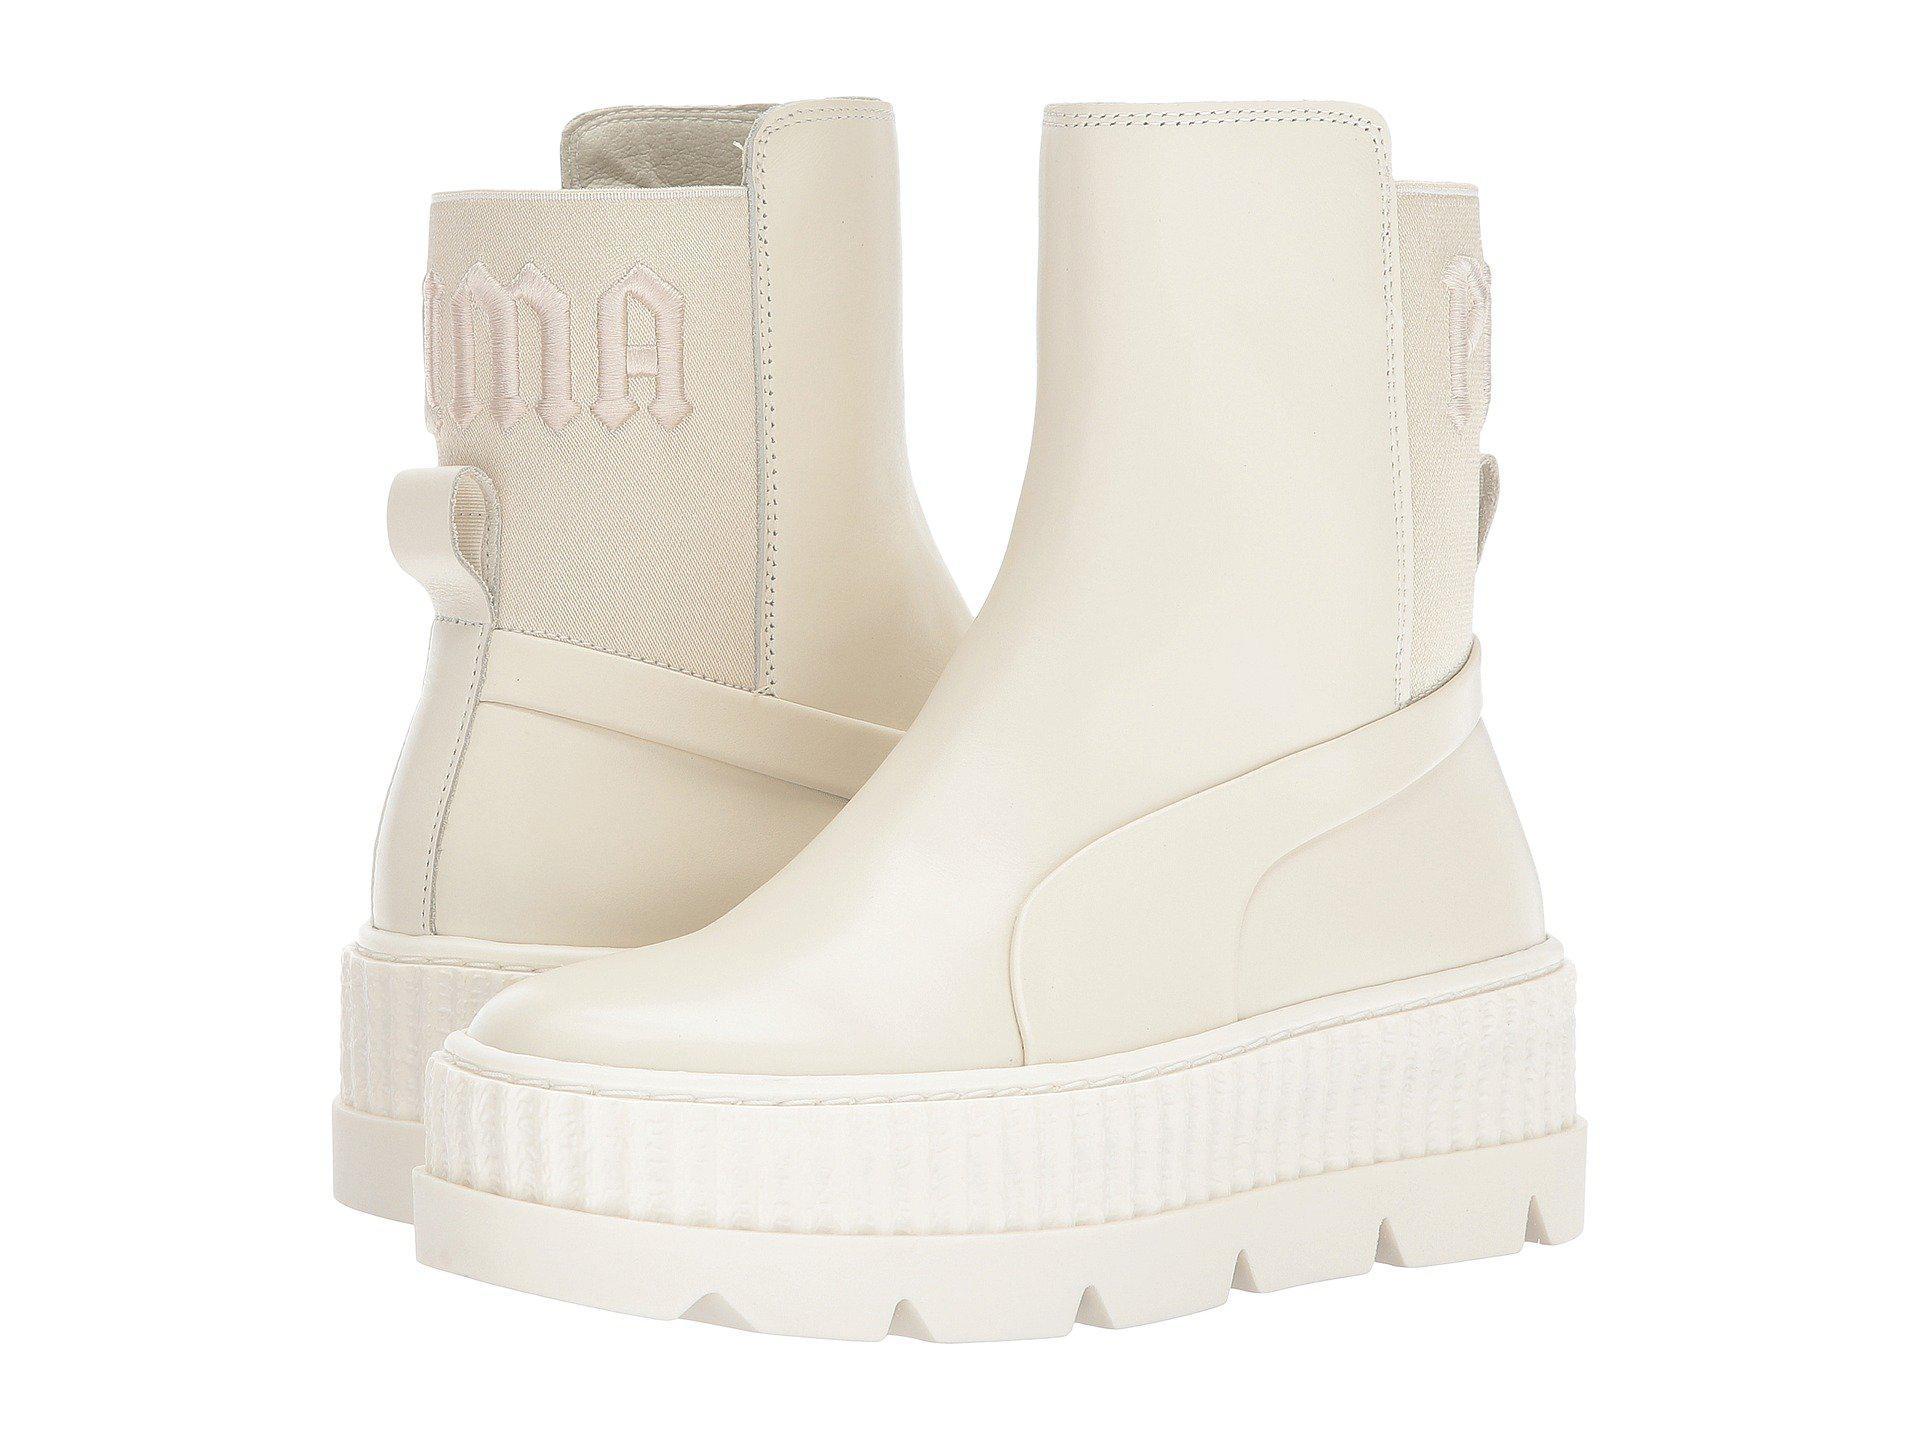 9176f2f95d1 Lyst - PUMA X Fenty By Rihanna Chelsea Sneaker Boot